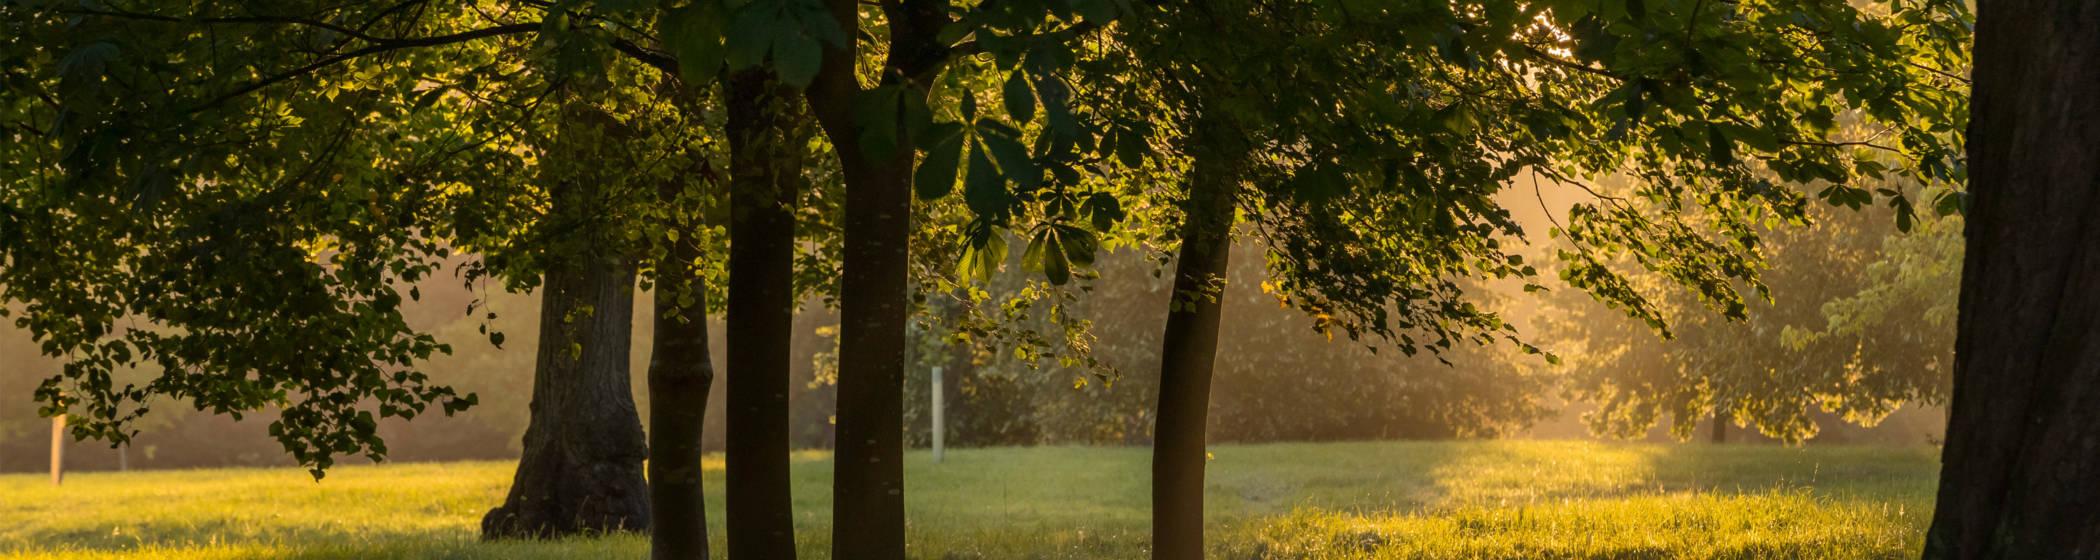 woods estate trees